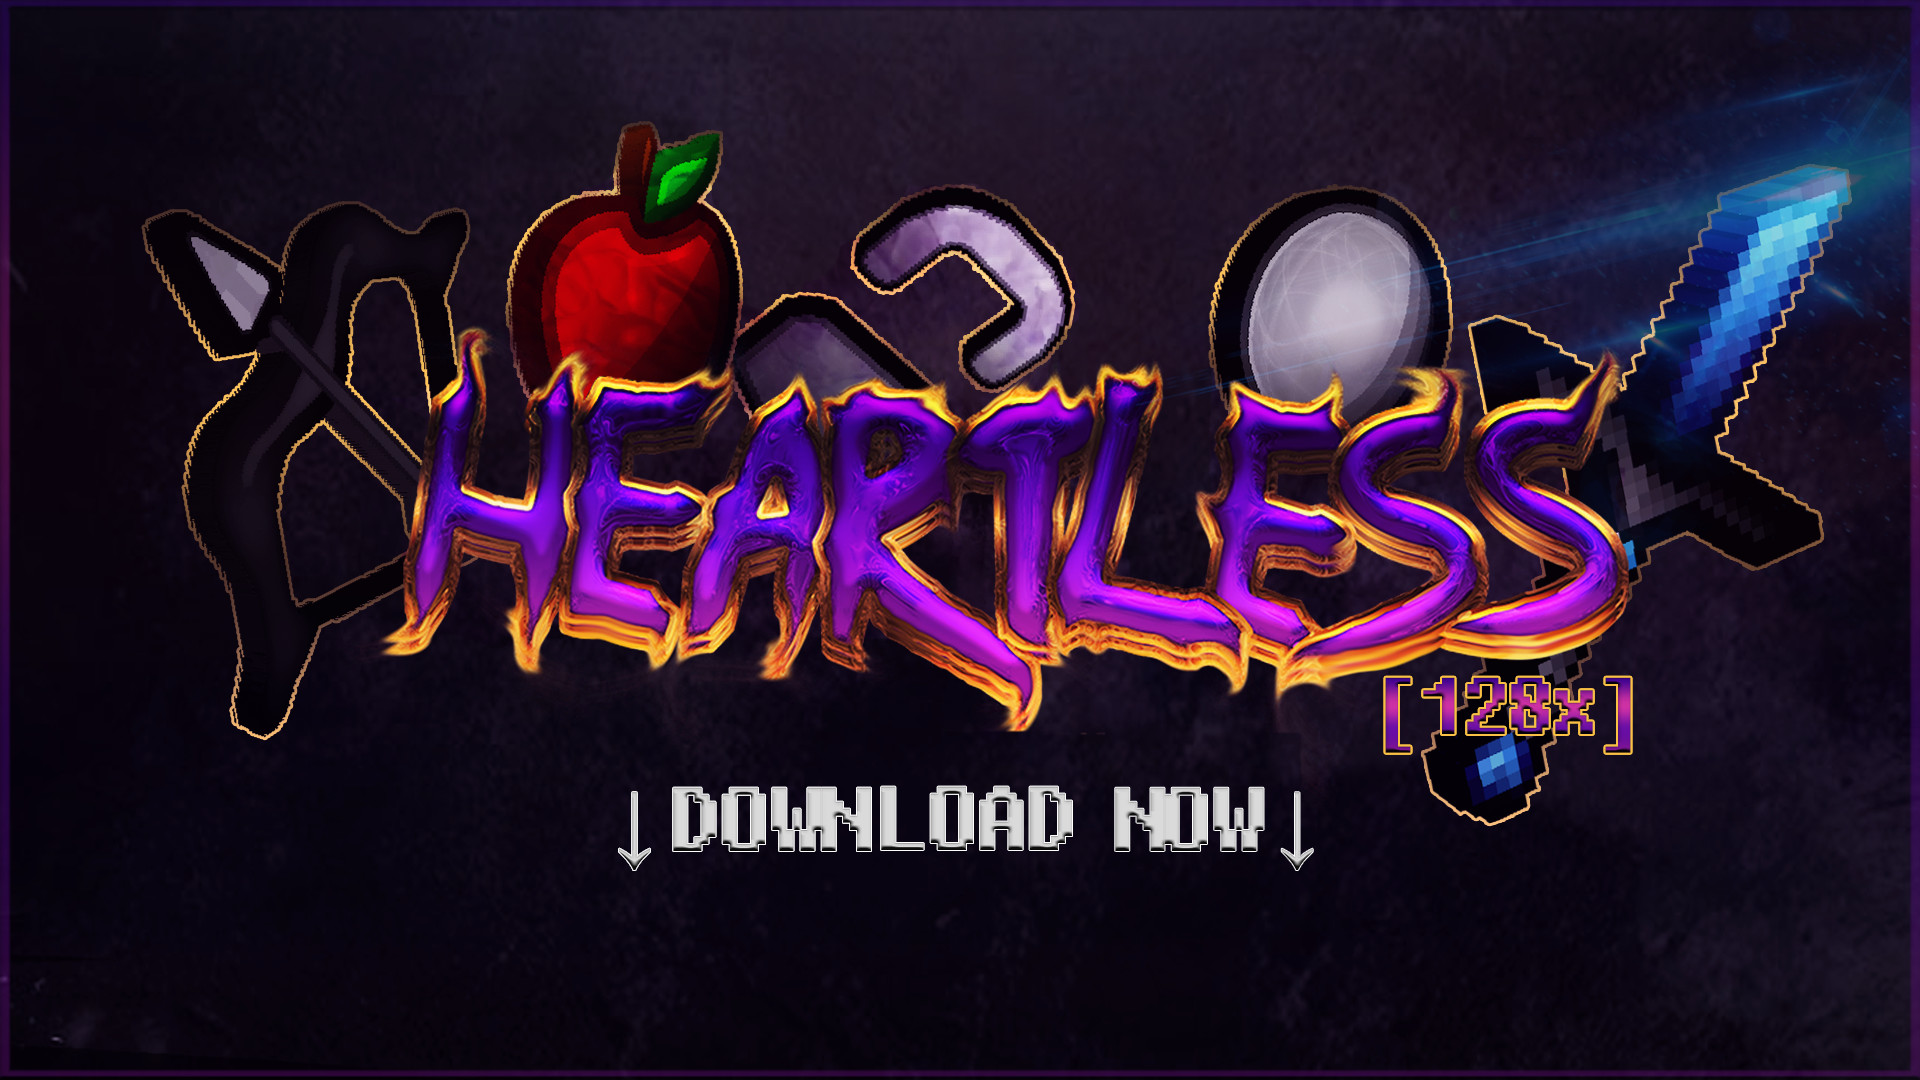 xHeartlessx 1.5k